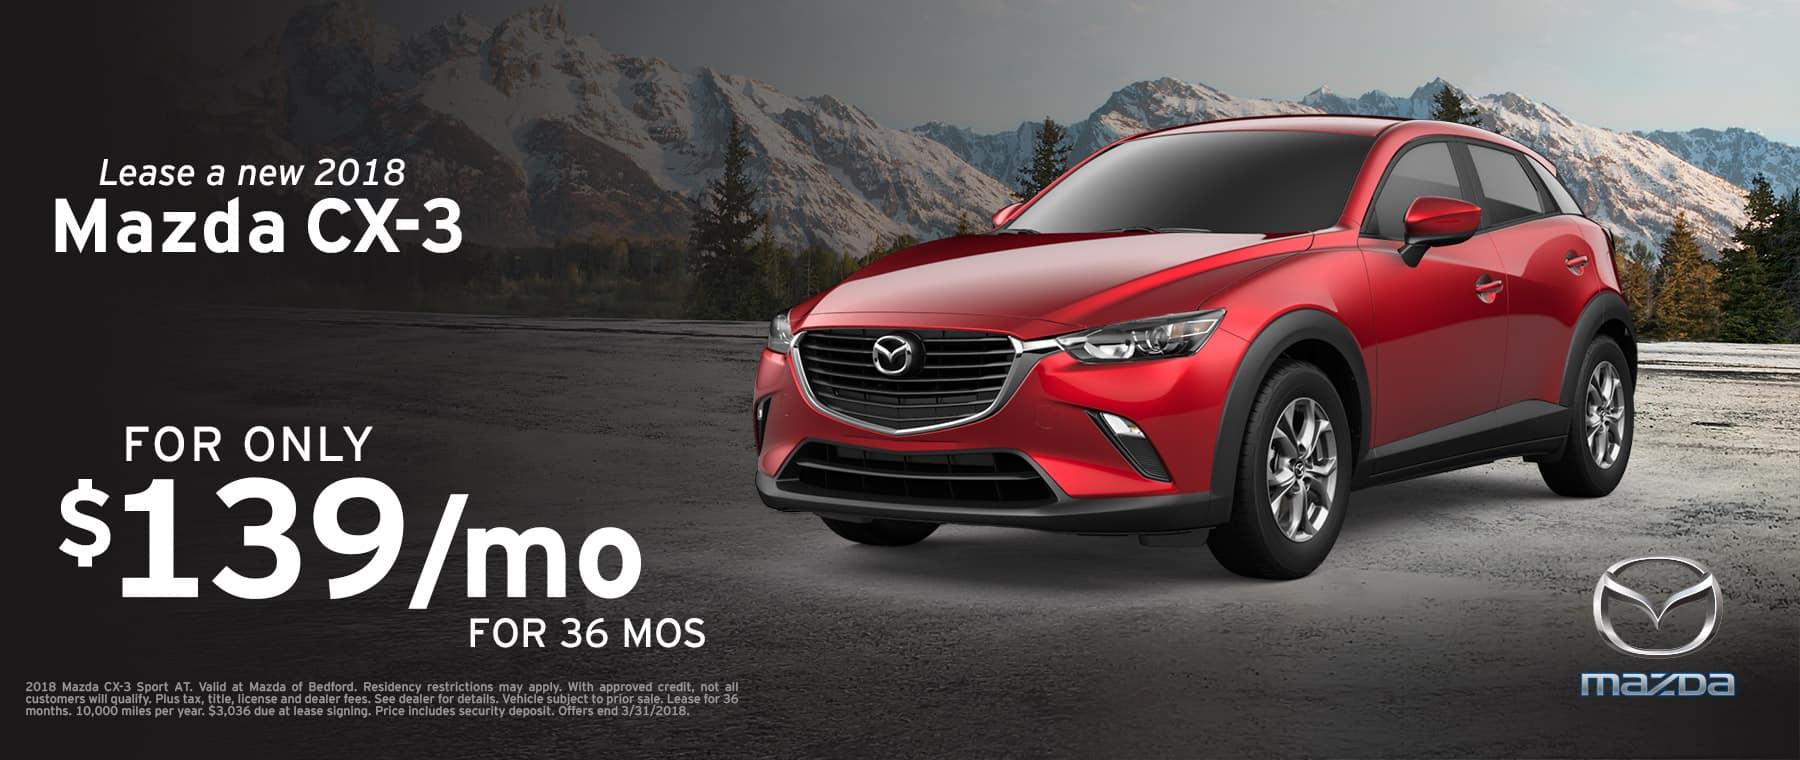 Mazda CX-3 Special